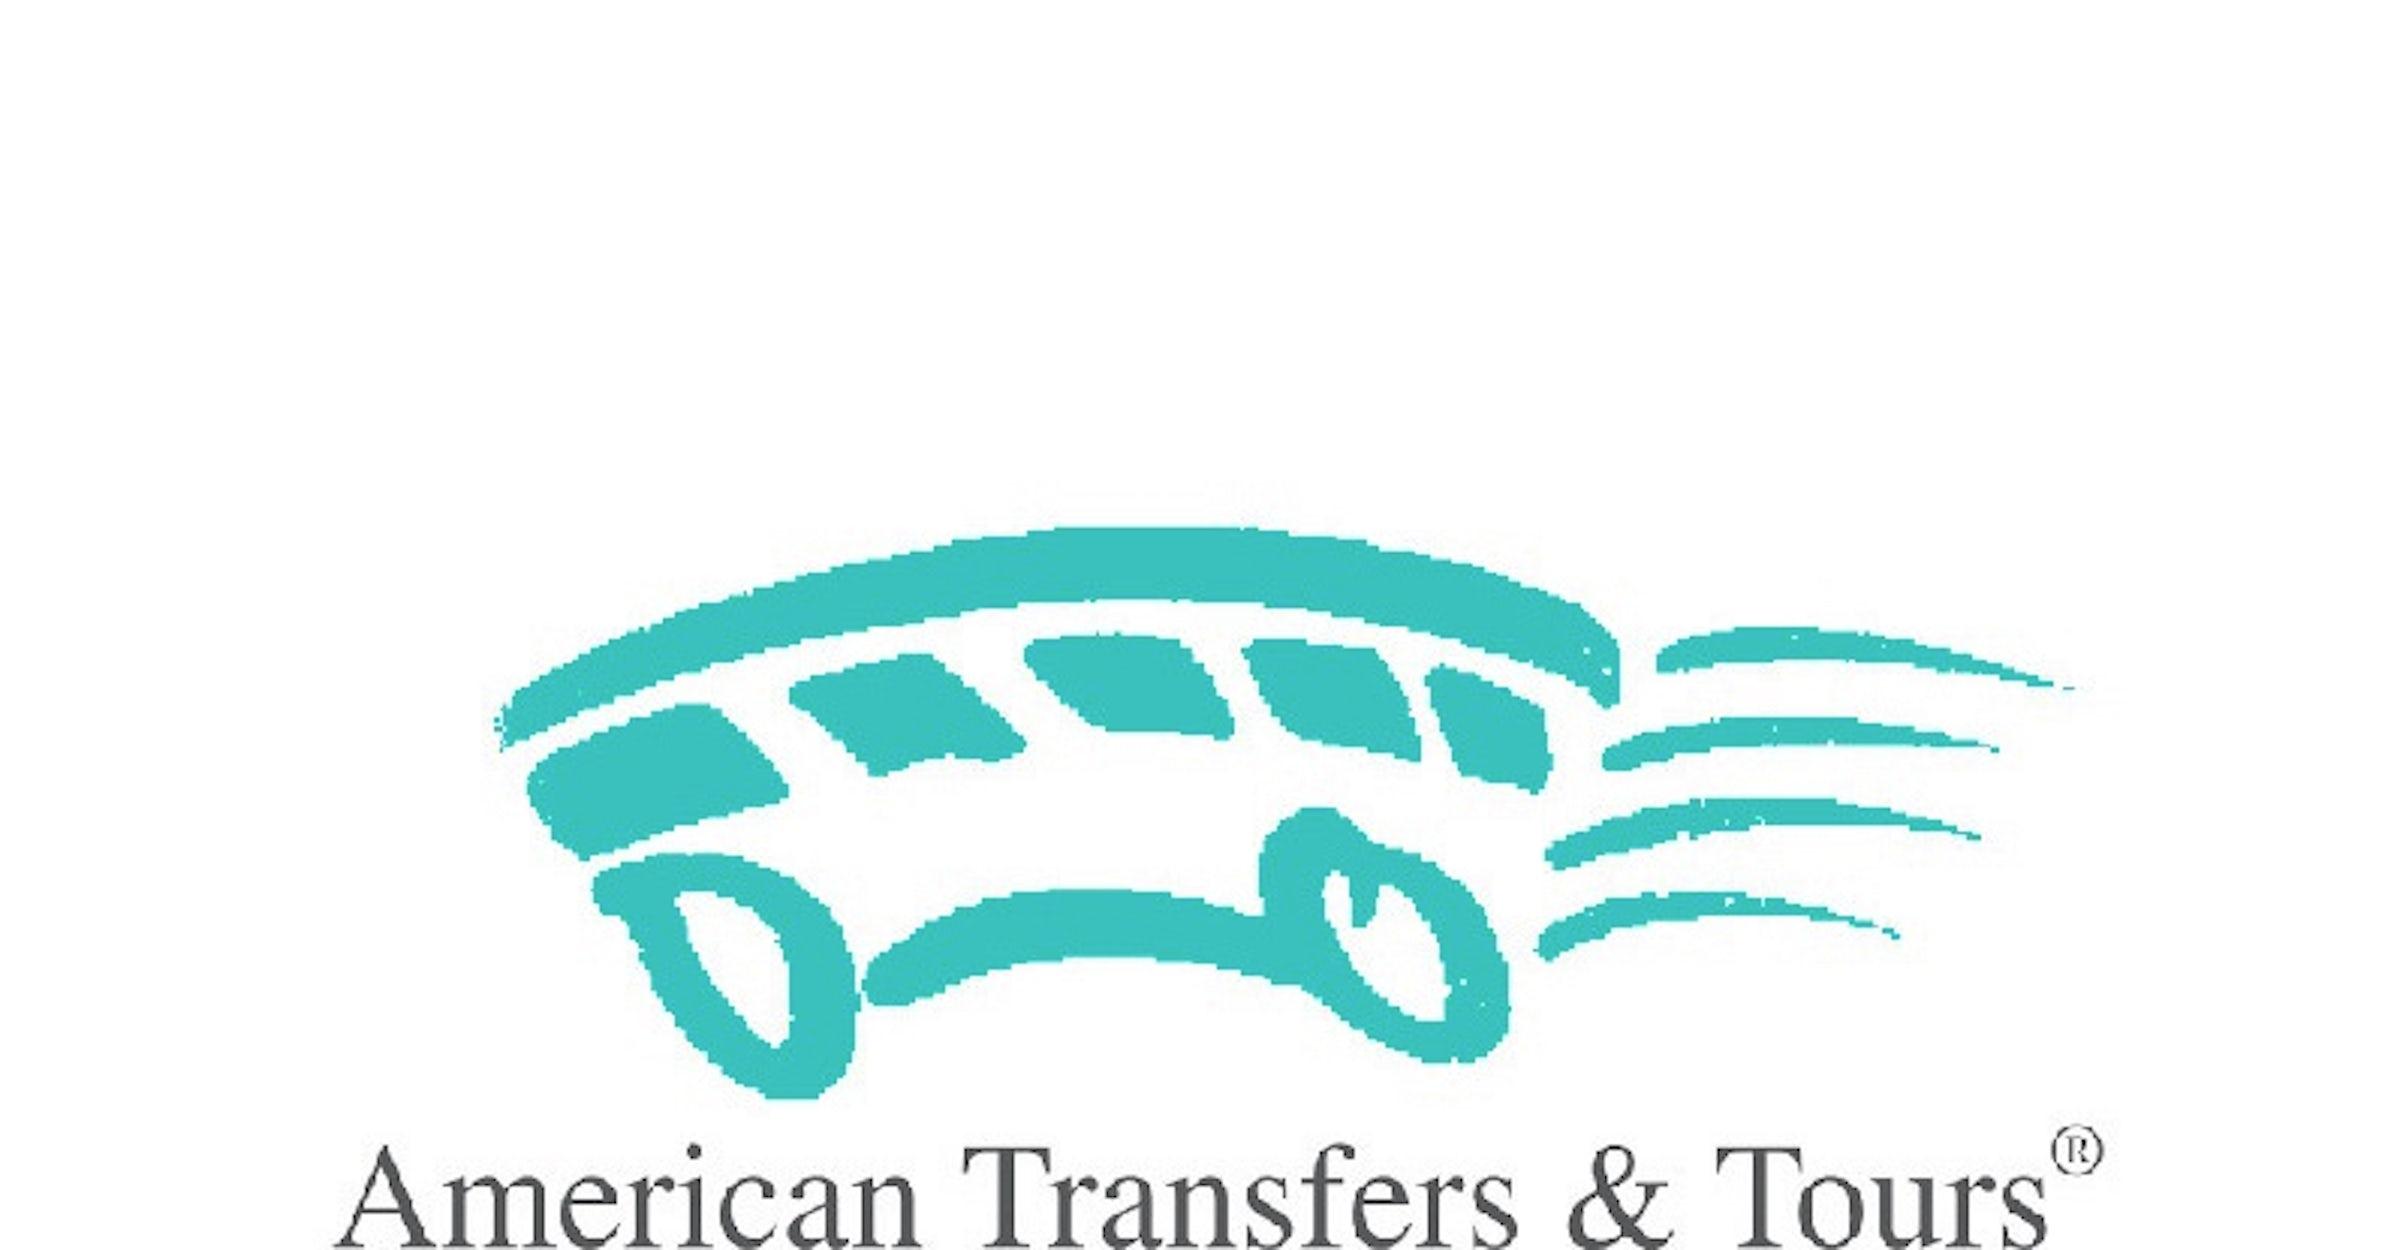 American Transfers & Tours in Beyond Dallas